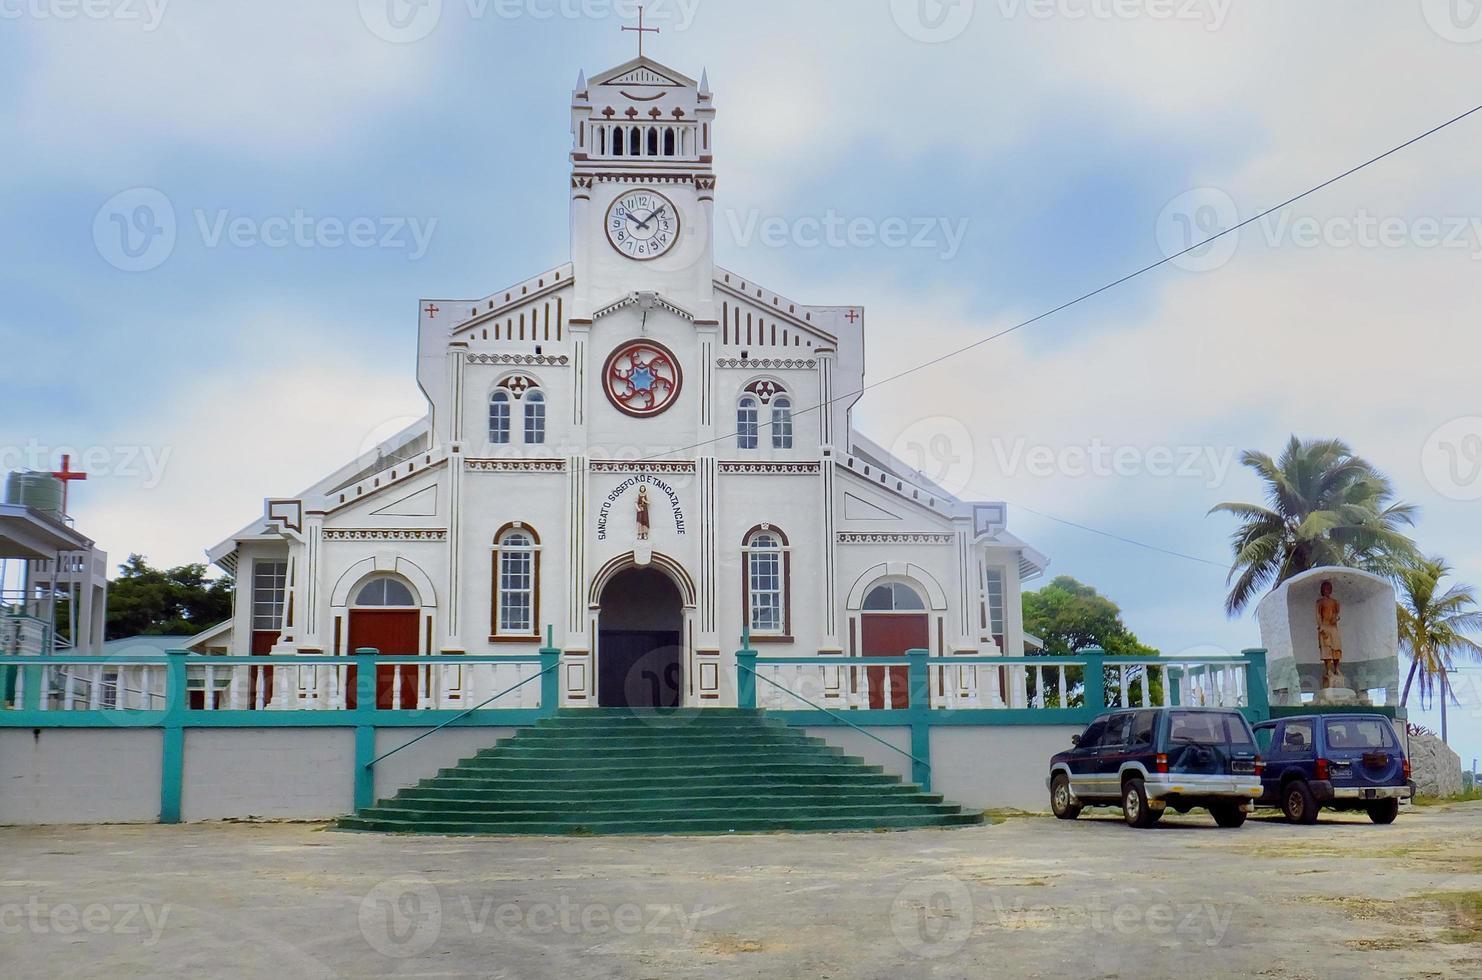 Catedral de San José en Neiafu, Vavau, Tonga foto